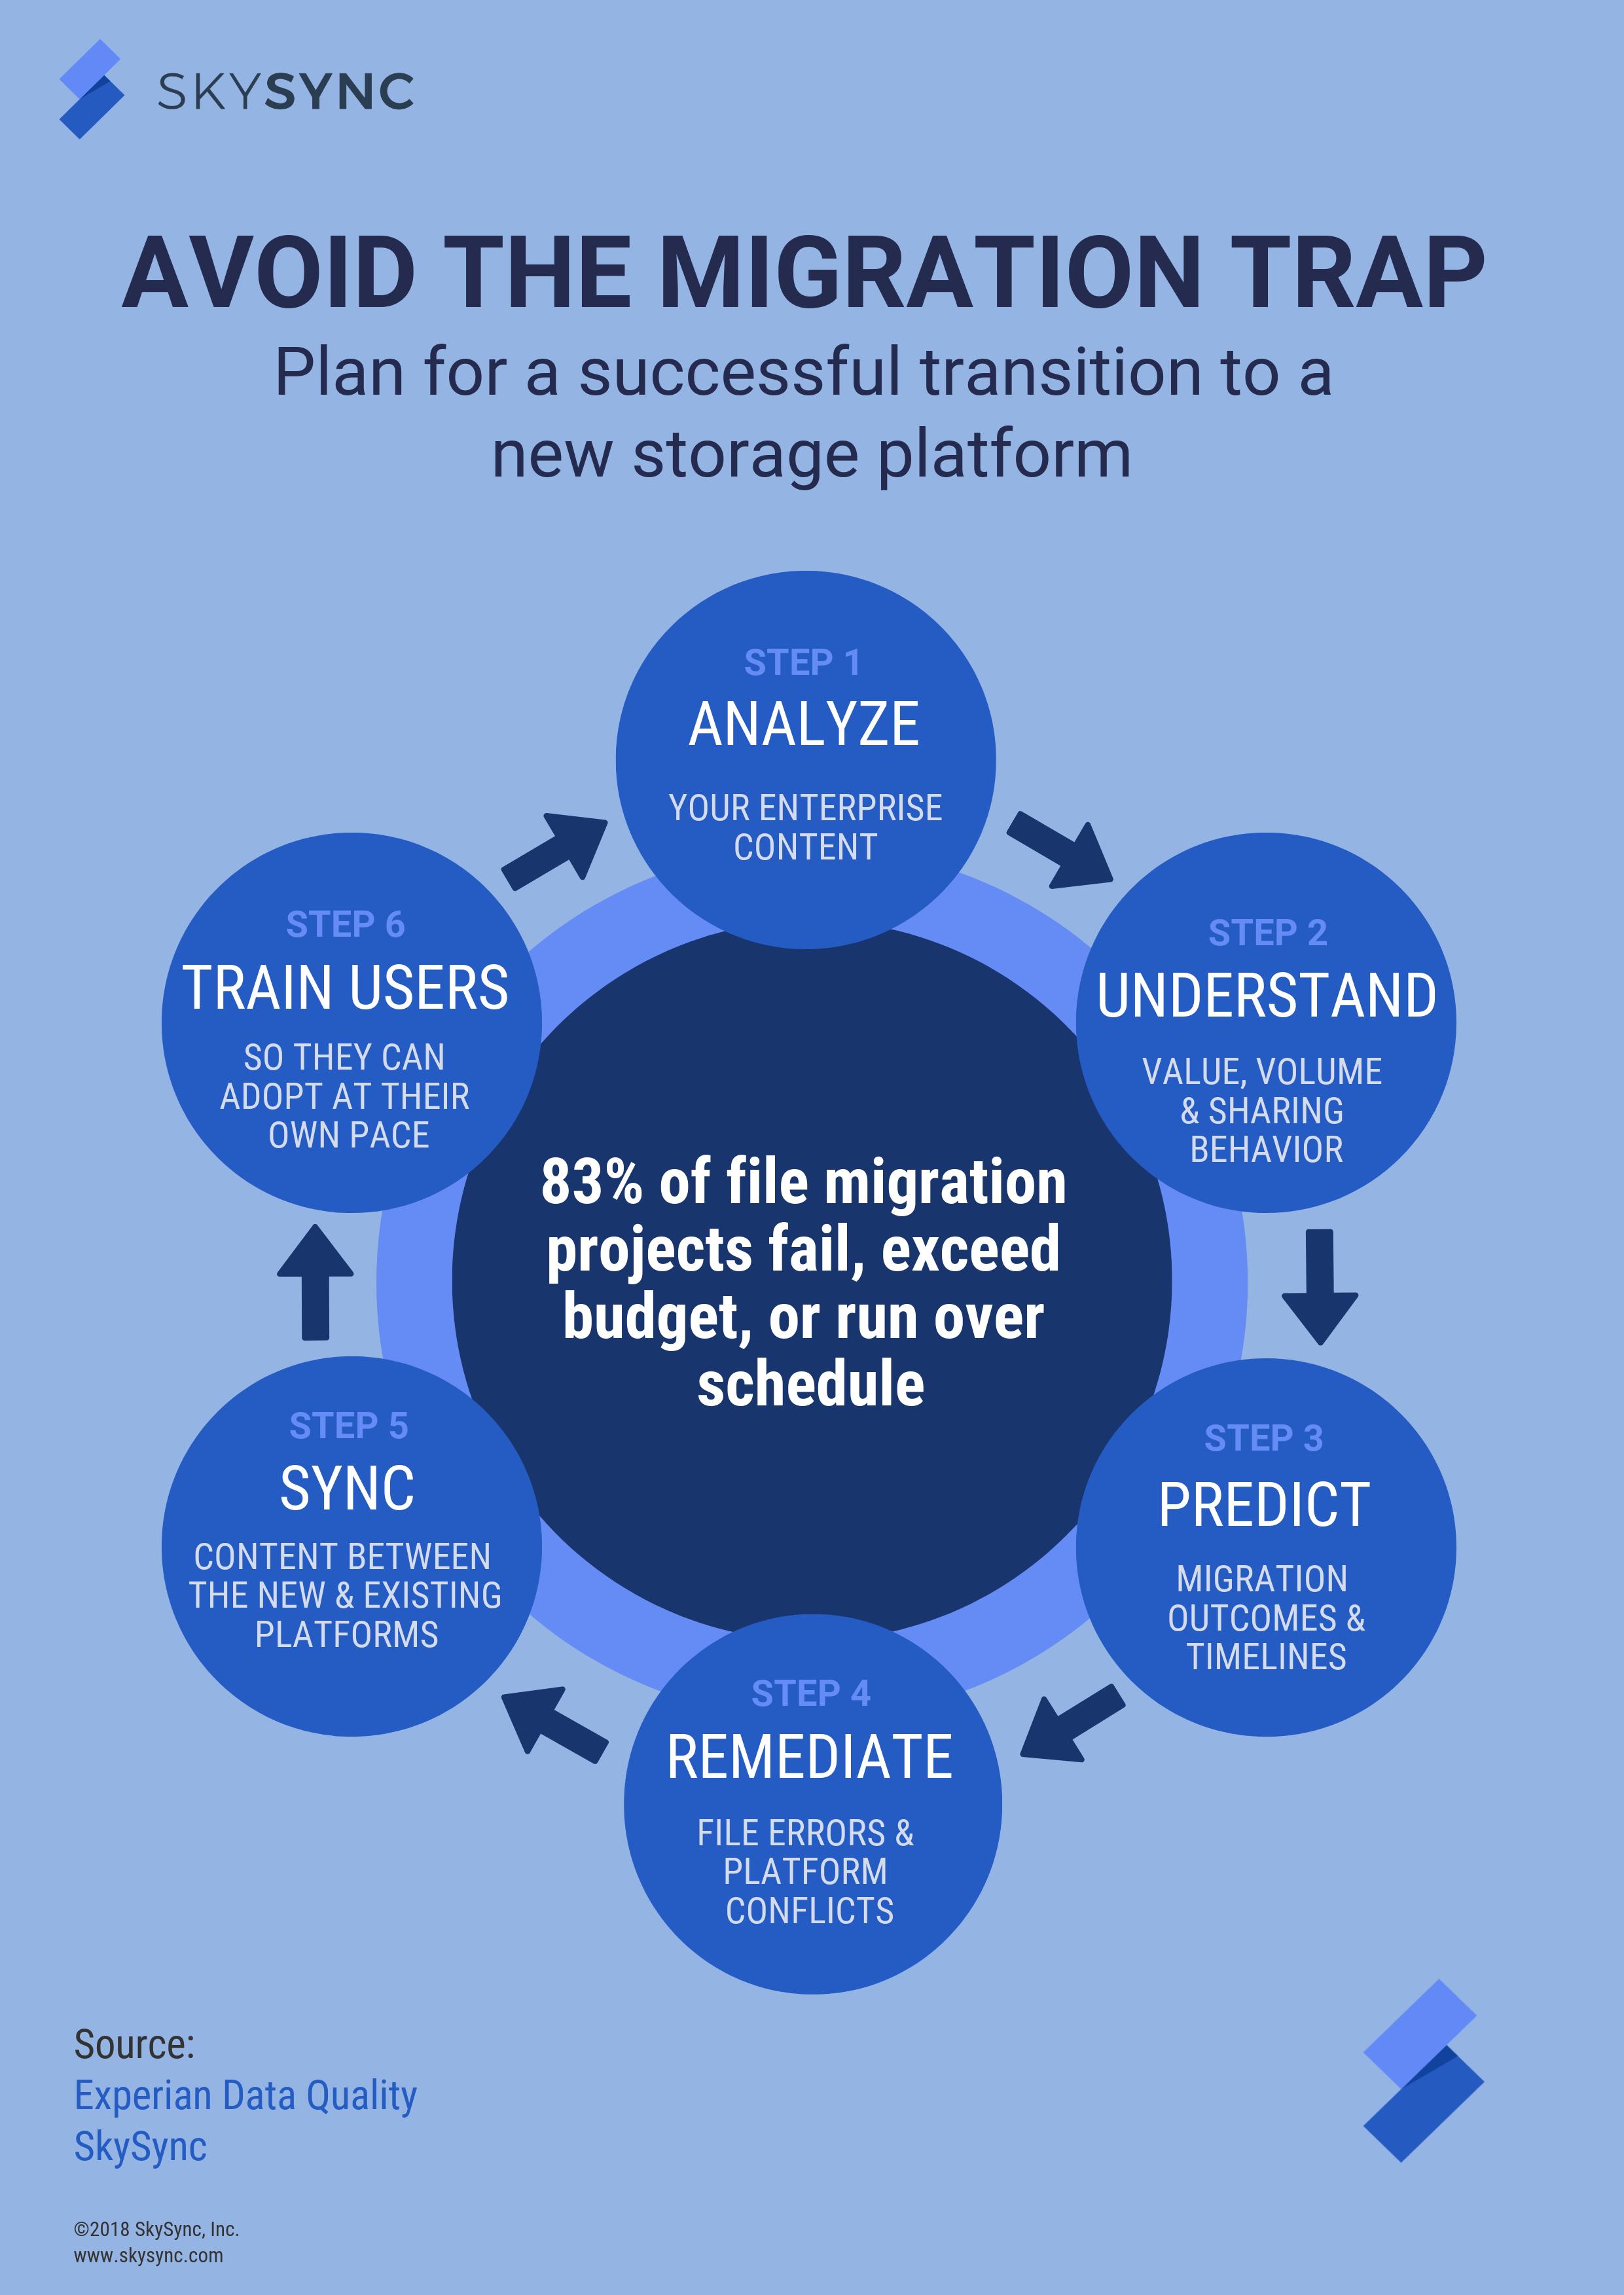 Plan for a successful cloud storage migration